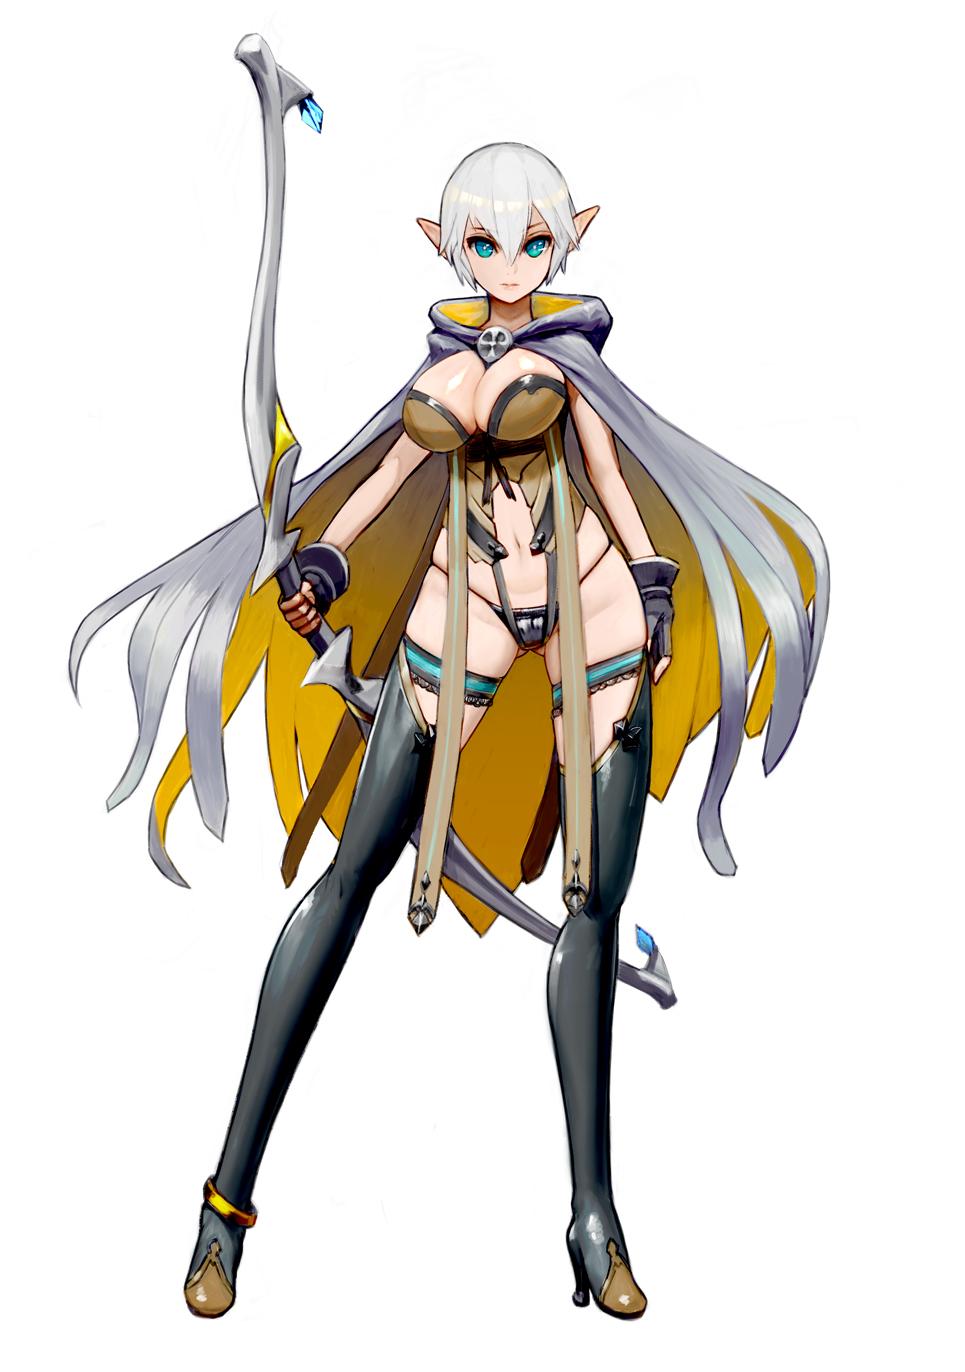 Anime 965x1372 big boobs cleavage anime girls anime archer boobs pointy ears fantasy girl